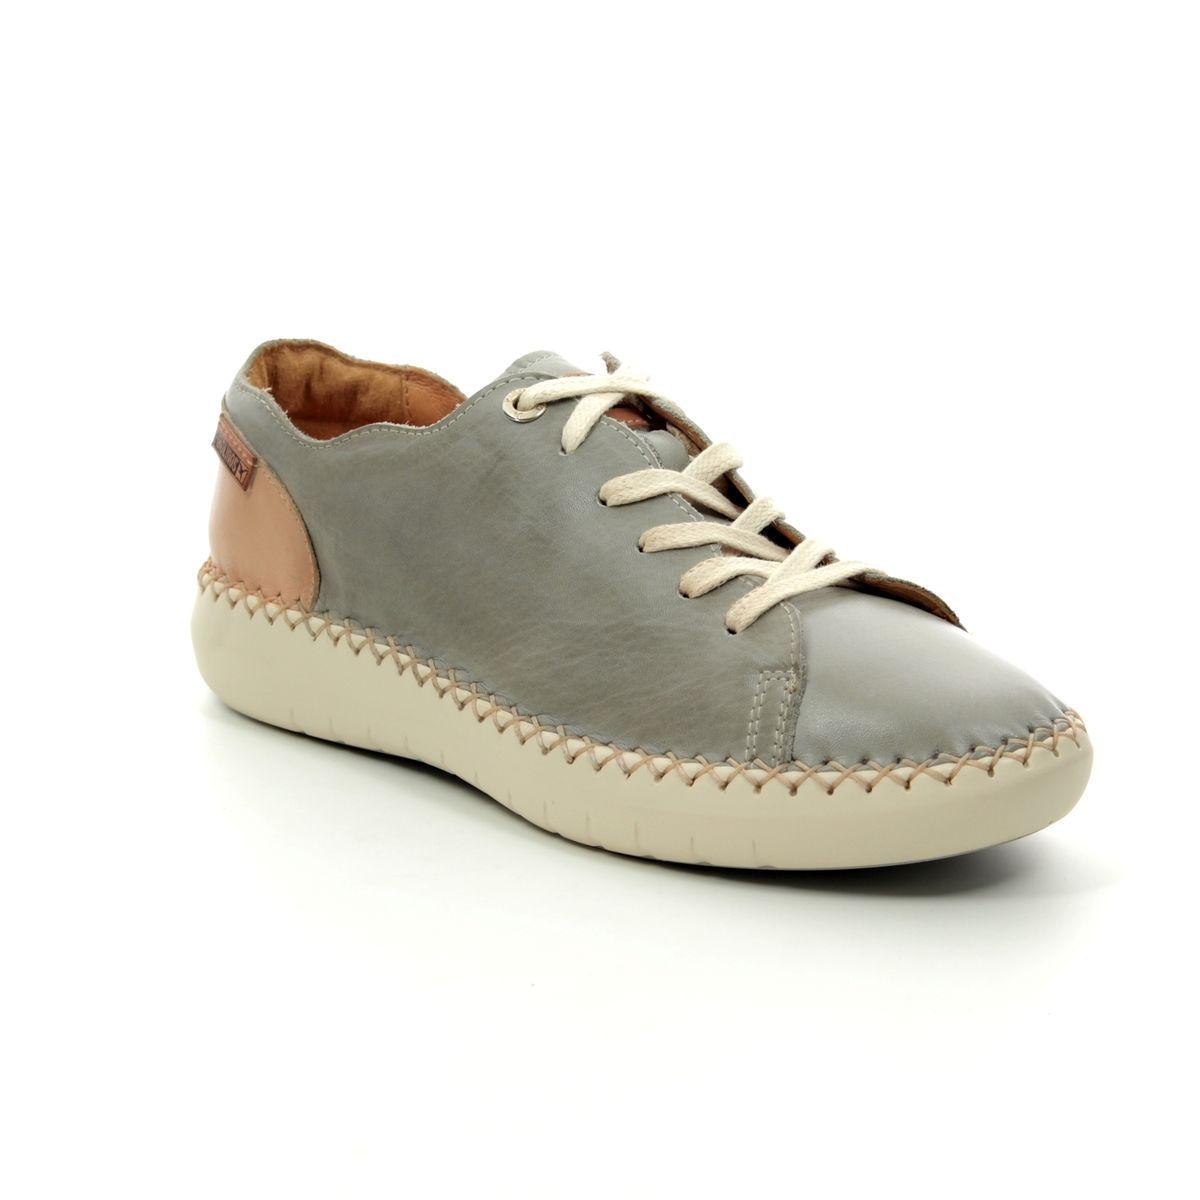 50873565dc8 Pikolinos Lacing Shoes - Grey matt leather - W0Y6836 00 MESINA